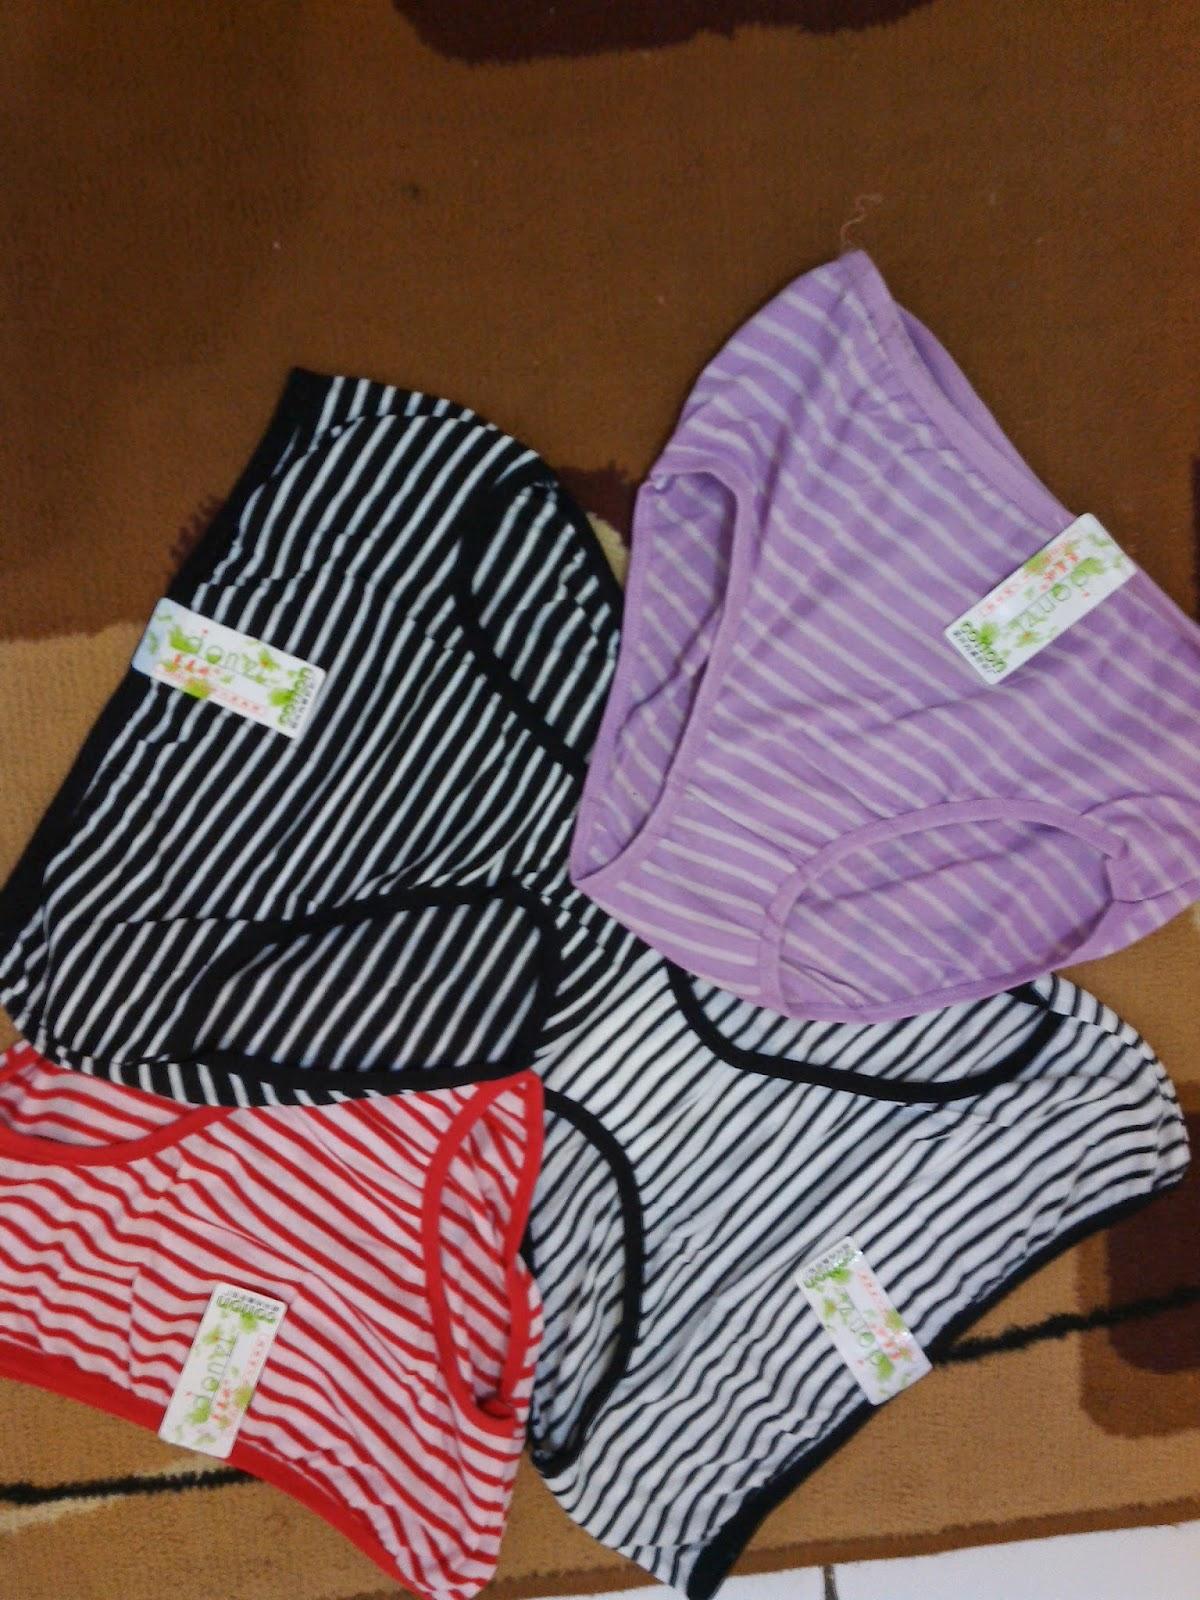 Harga Jual Celana Dalam Wanita Sorex 6 Pcs Cd Renda Pusat Grosir Merk